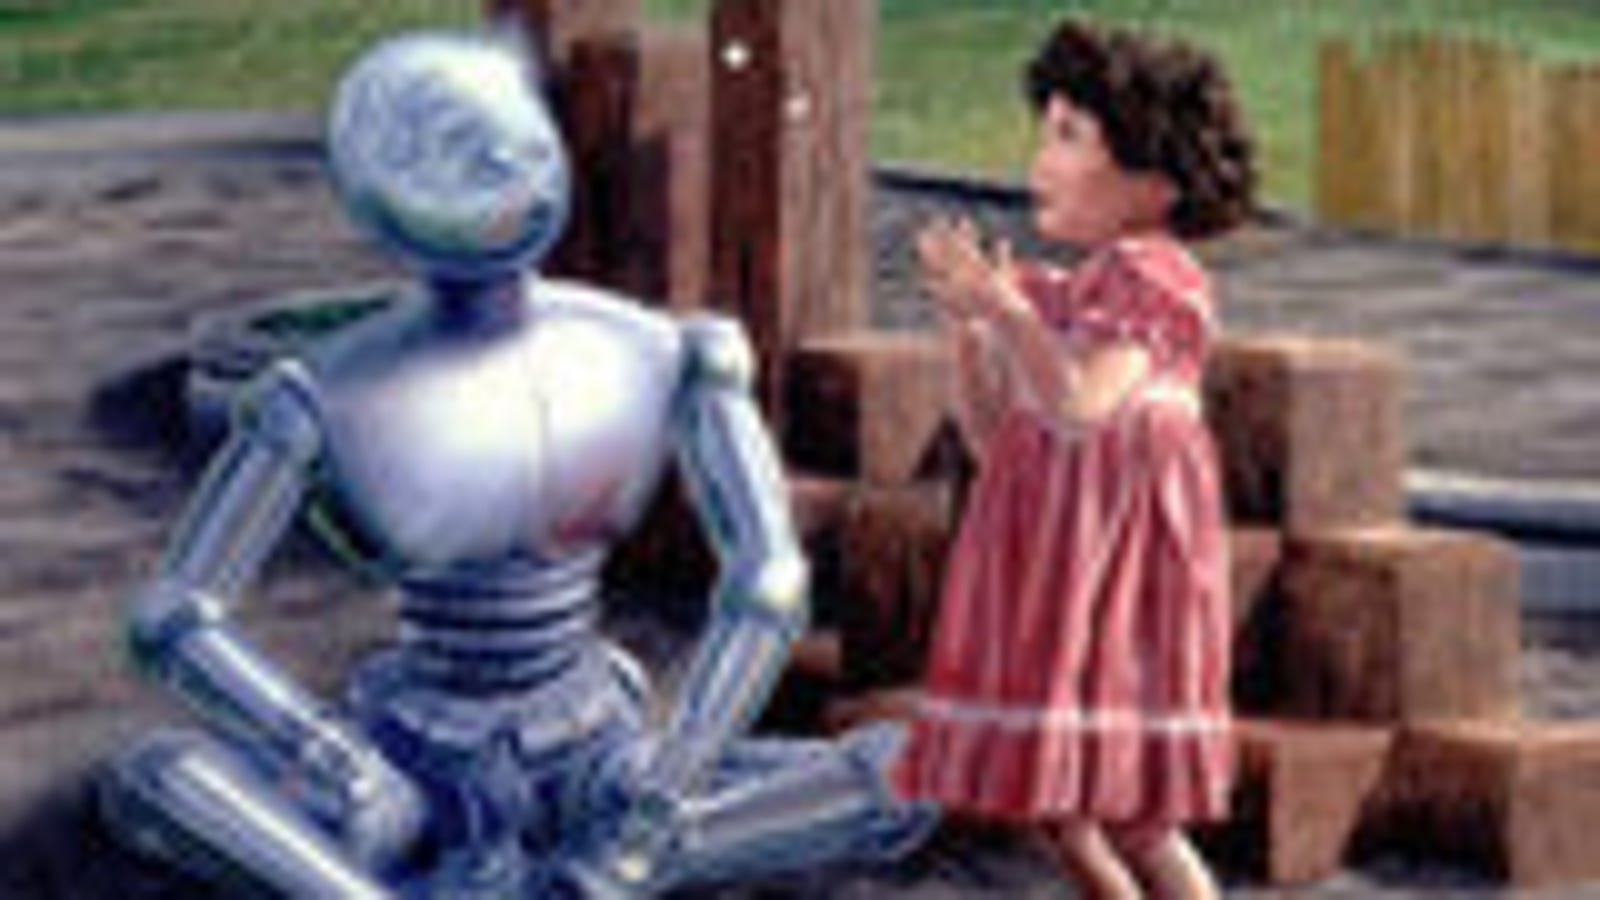 analysis dr susan calvin robot isaac asimov Susan calvin - characters, i robot | edurev edurev  calvin attends a psycho-math seminar led by dr alfred lanning (introduction3)  robot by isaac asimov .